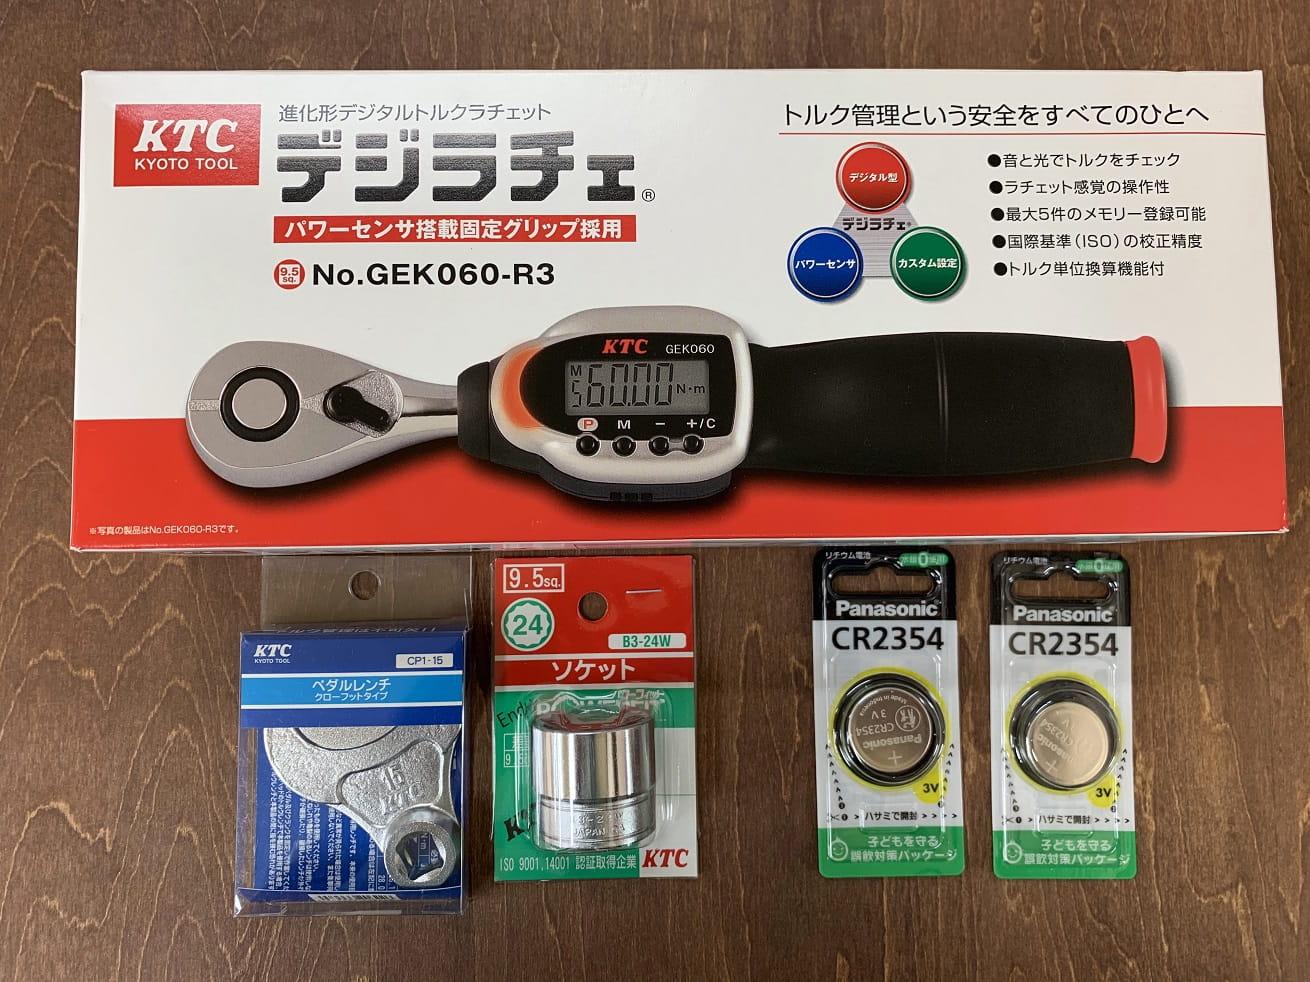 KTCデジラチェとデジラチェ用ペダルレンチ、専用ボタン電池、24mmソケット